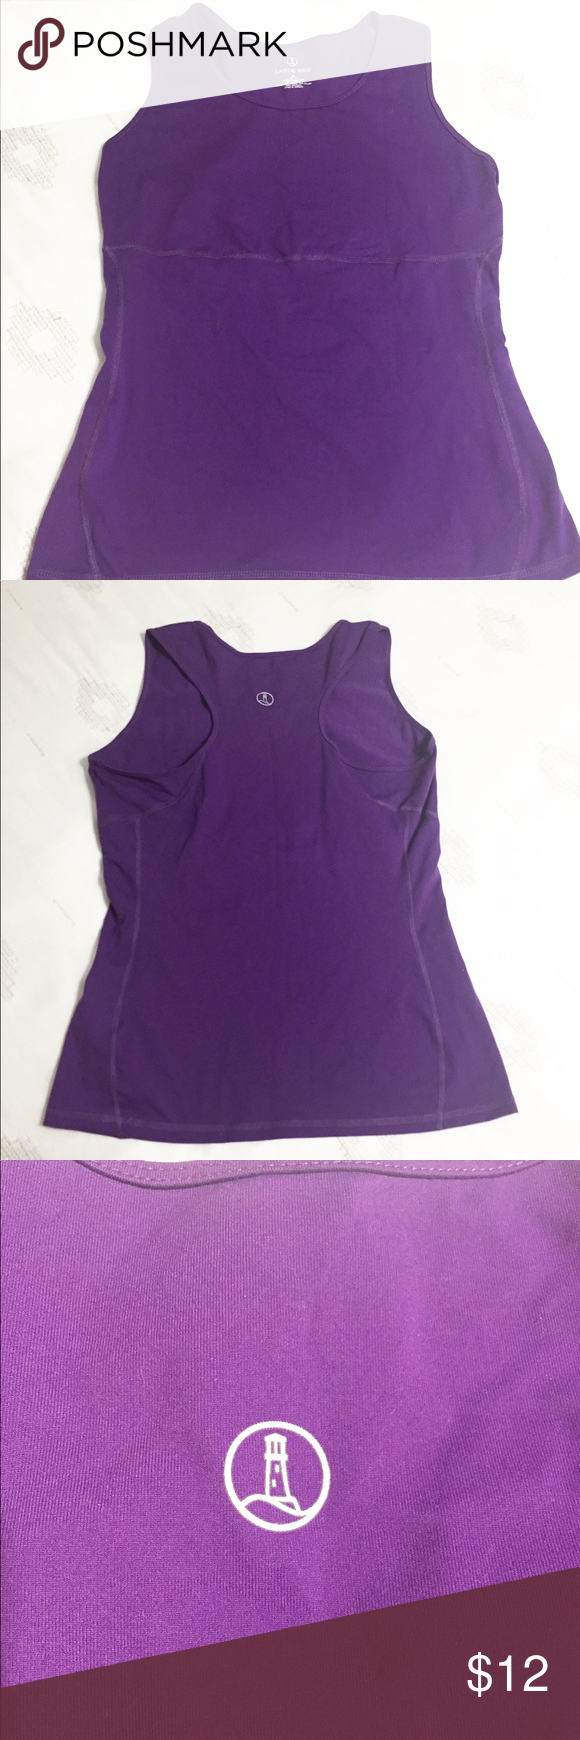 7bf5c761d6287 Lands  End women s purple athletic top. Size 8-10 Lands  End women s purple  athletic top. Size Medium (8-10). Lands  End Tops Tank Tops